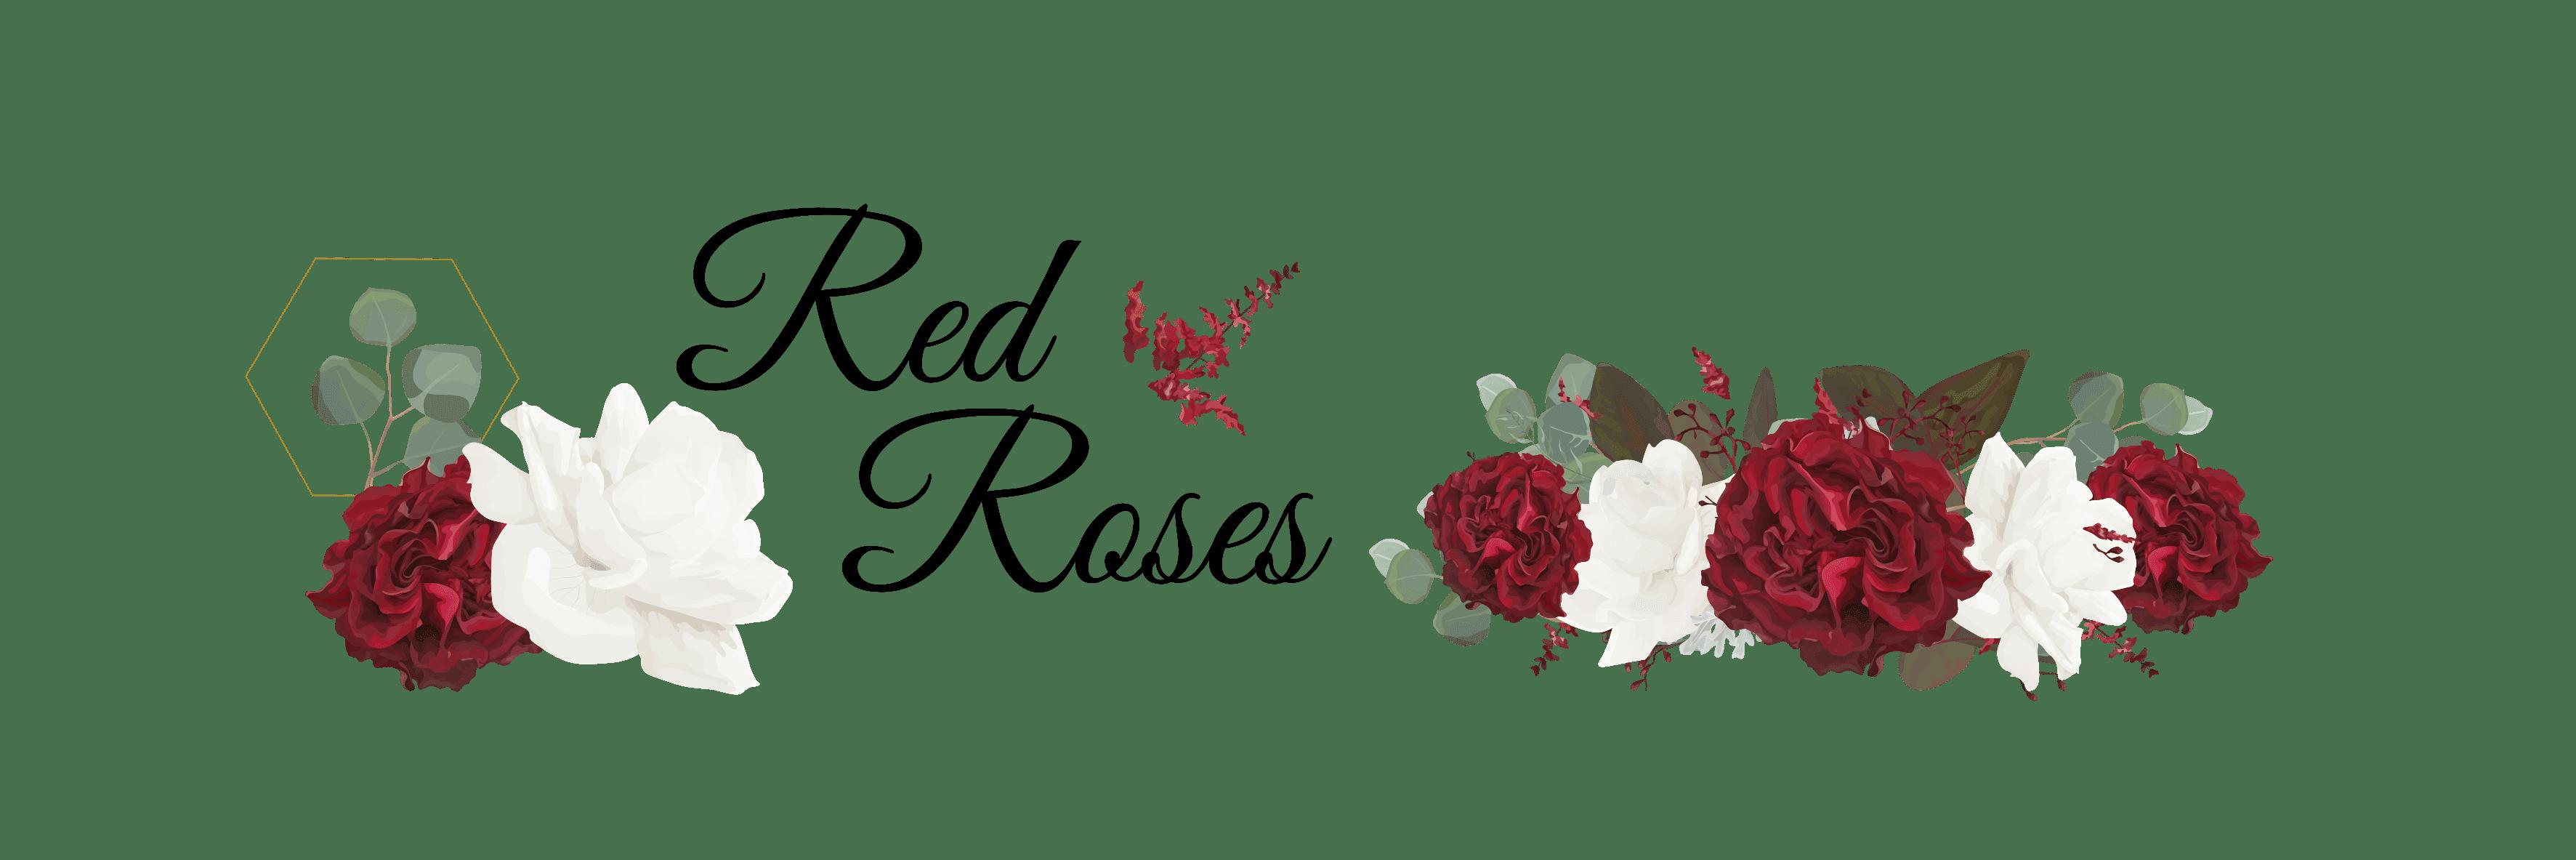 Kollektion Red Roses